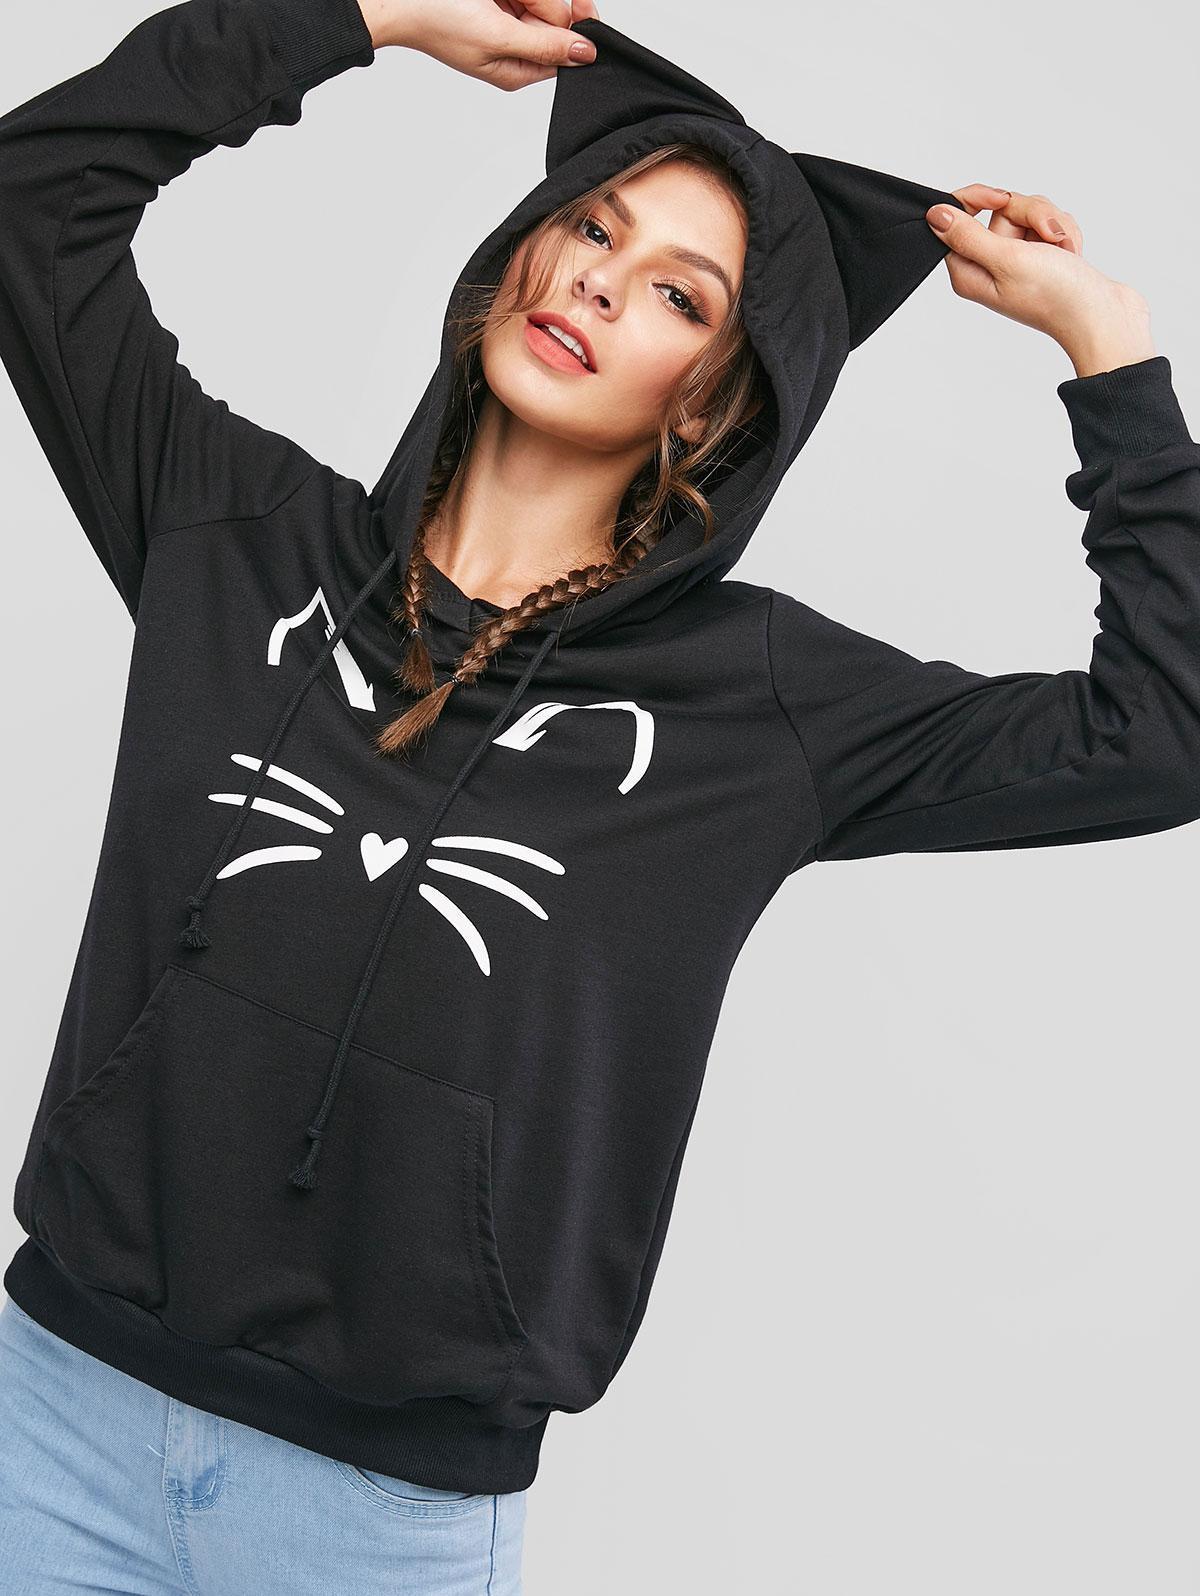 ZAFUL кенгуру карман толстовка с капюшоном с изображением кошки